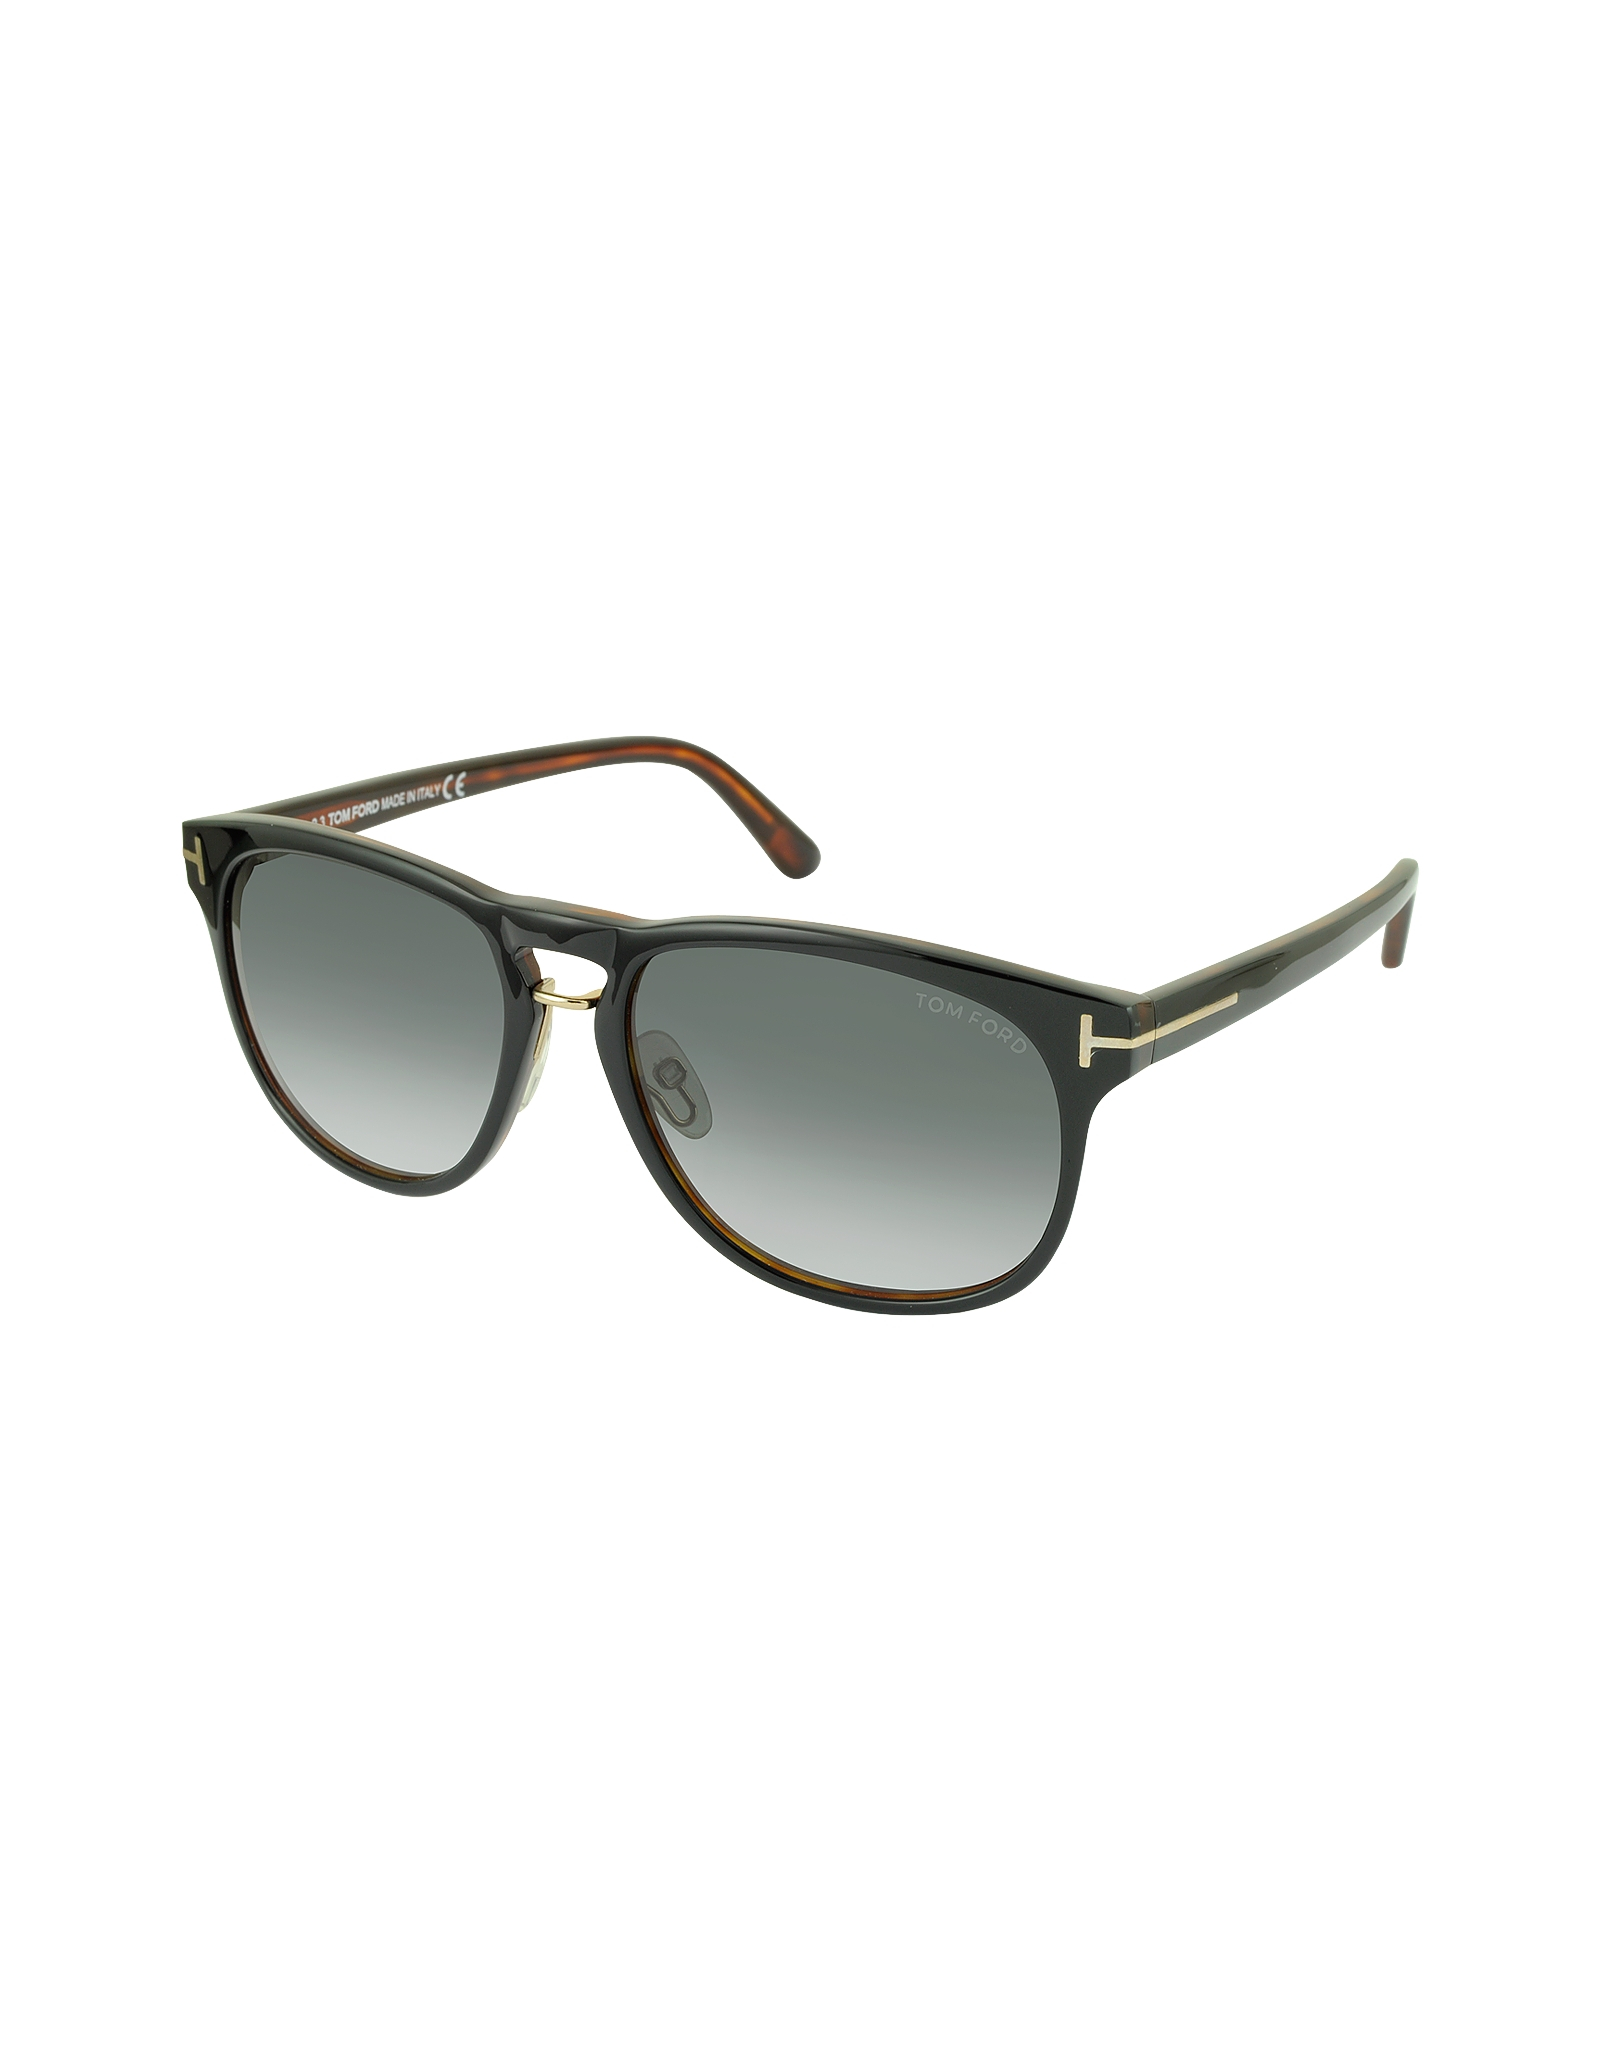 Lyst Tom Ford Franklin Ft0346 01v Dark Brown Aviator Sunglasses in